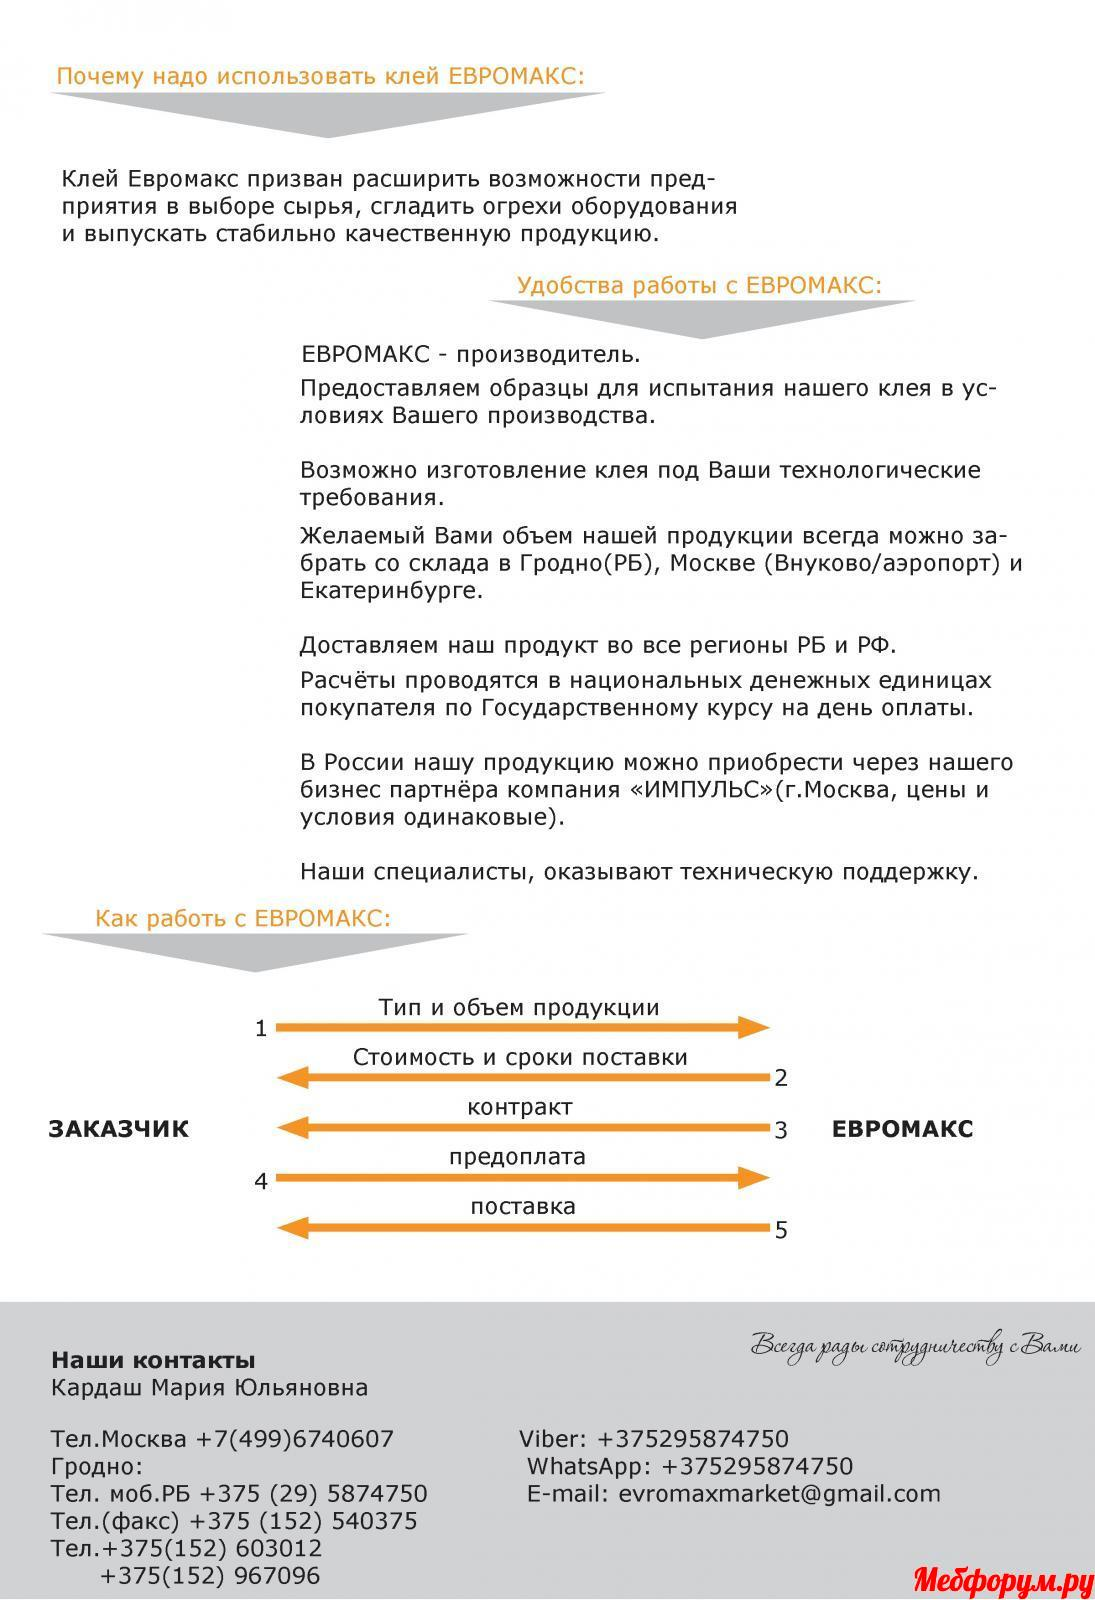 евромакс клей(2).jpg